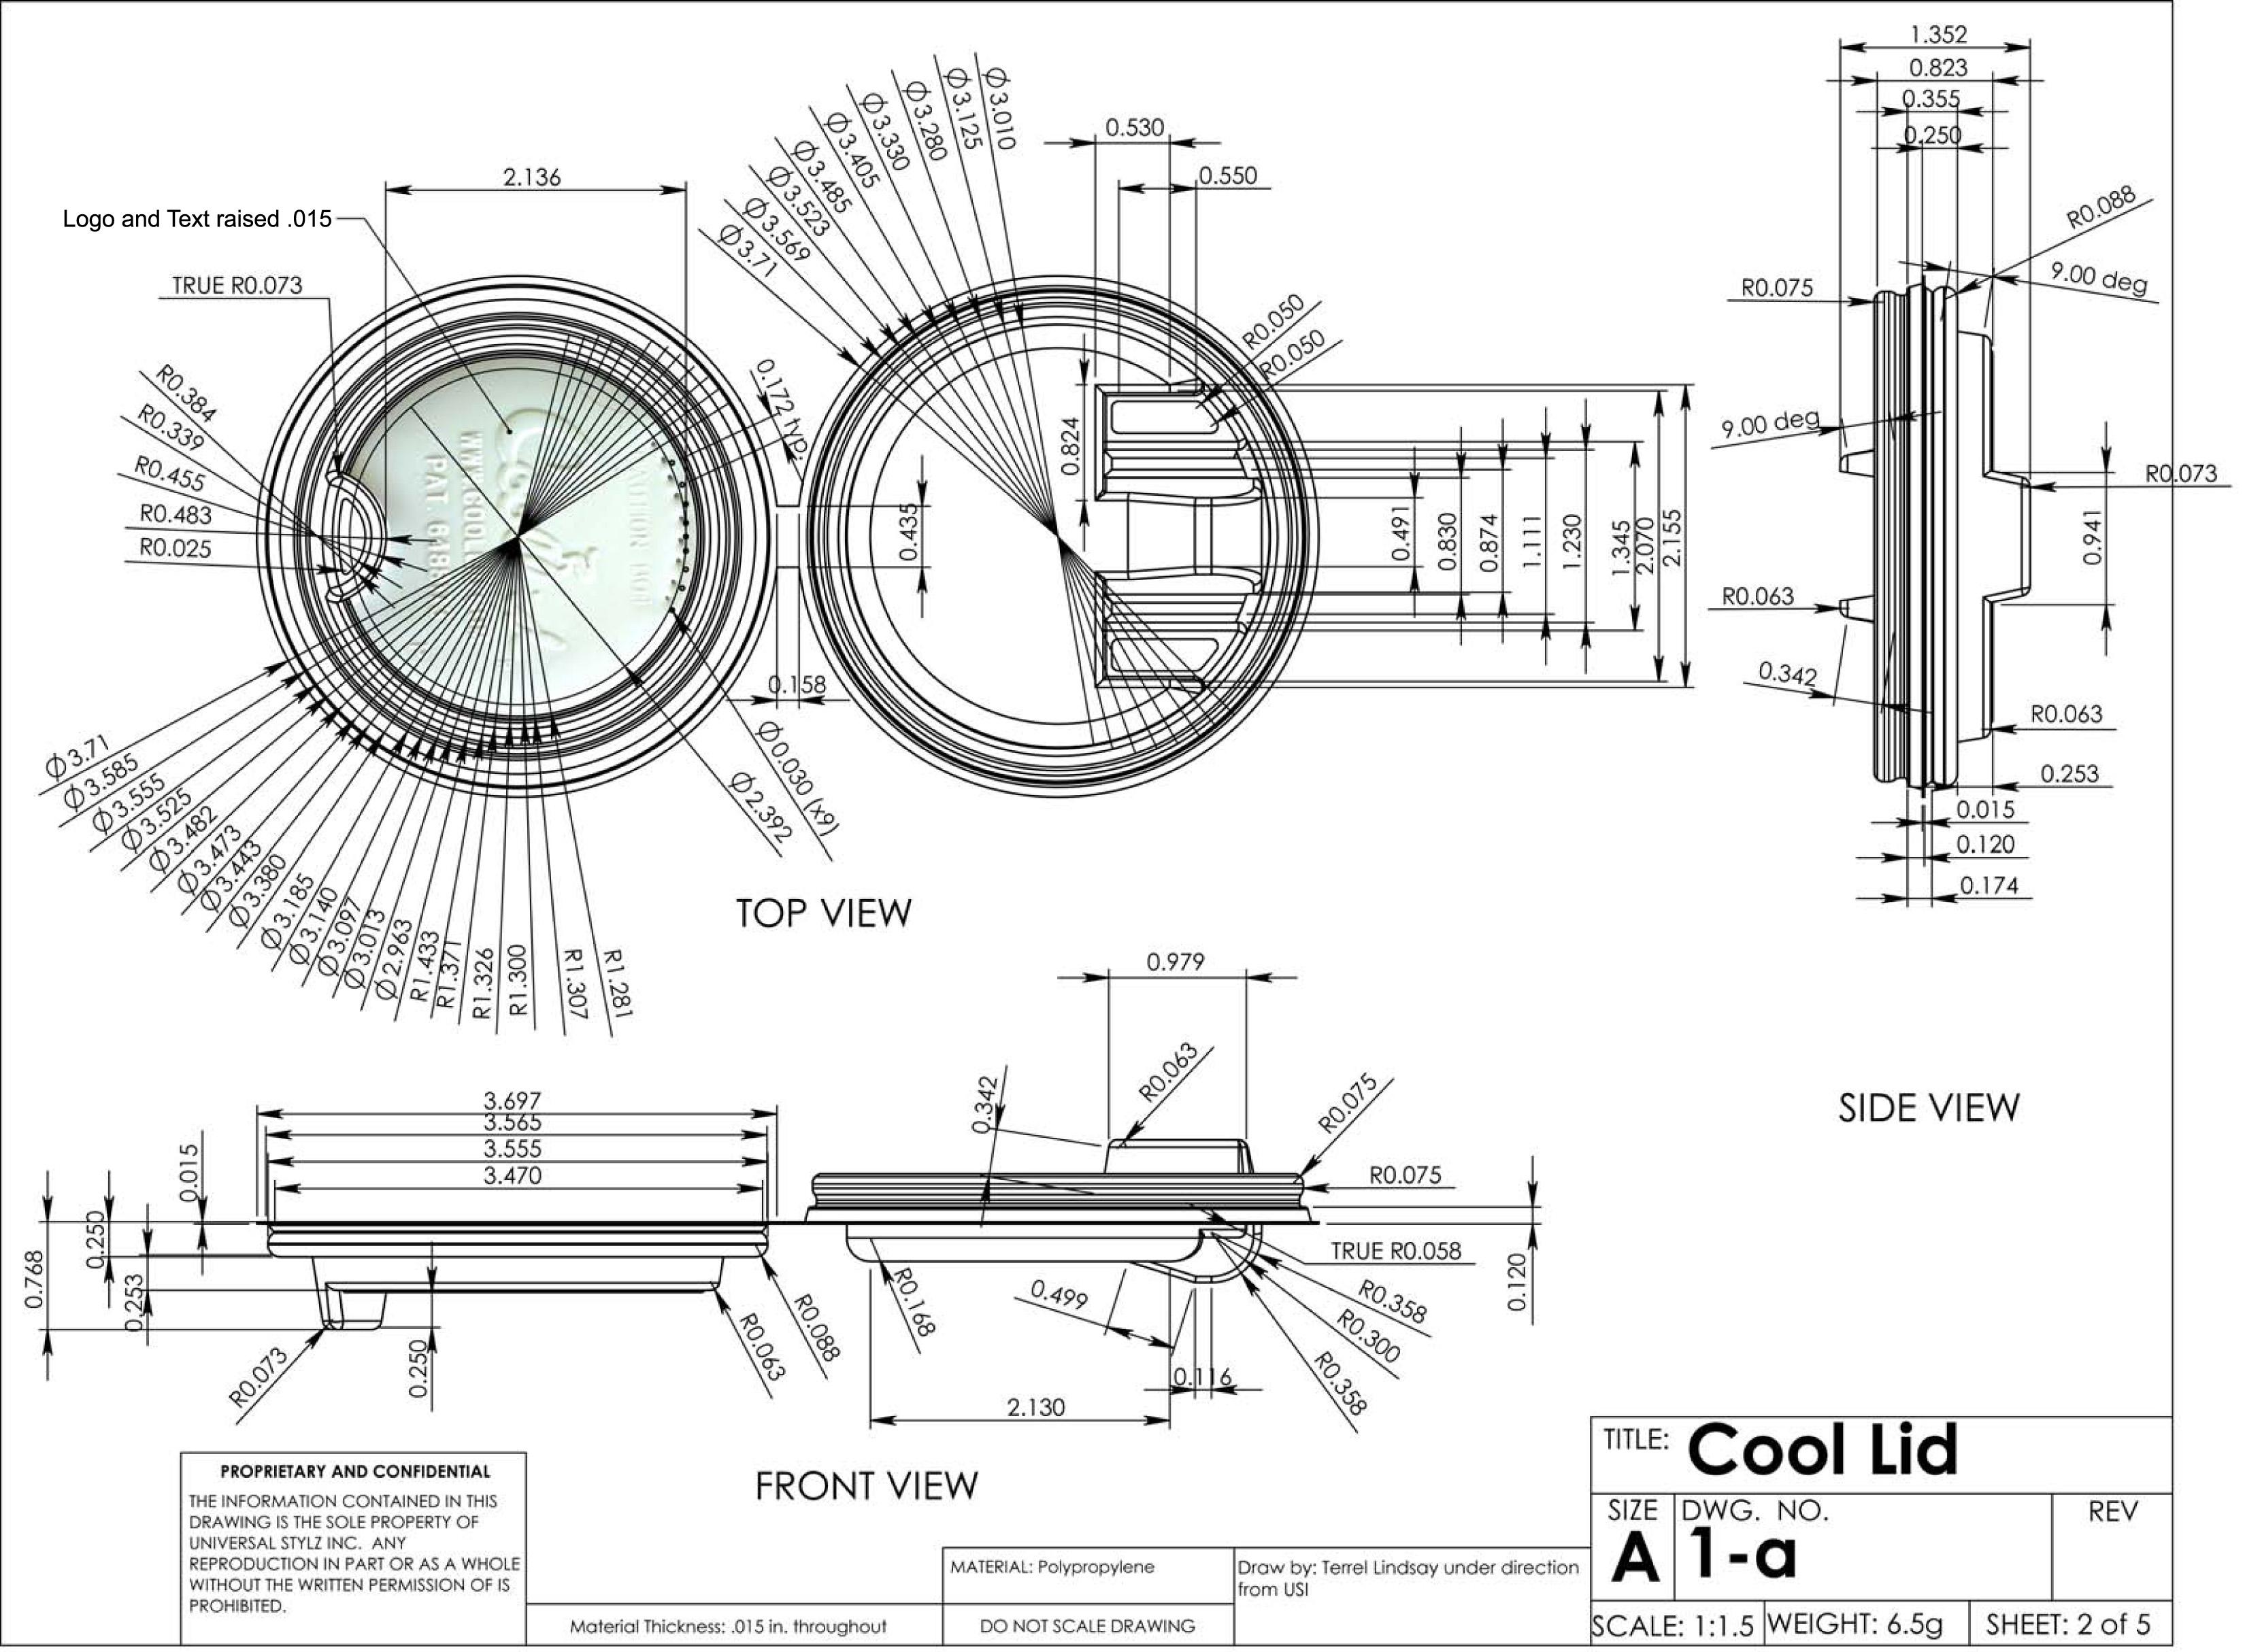 solidworks models by terrel lindsay at coroflot com